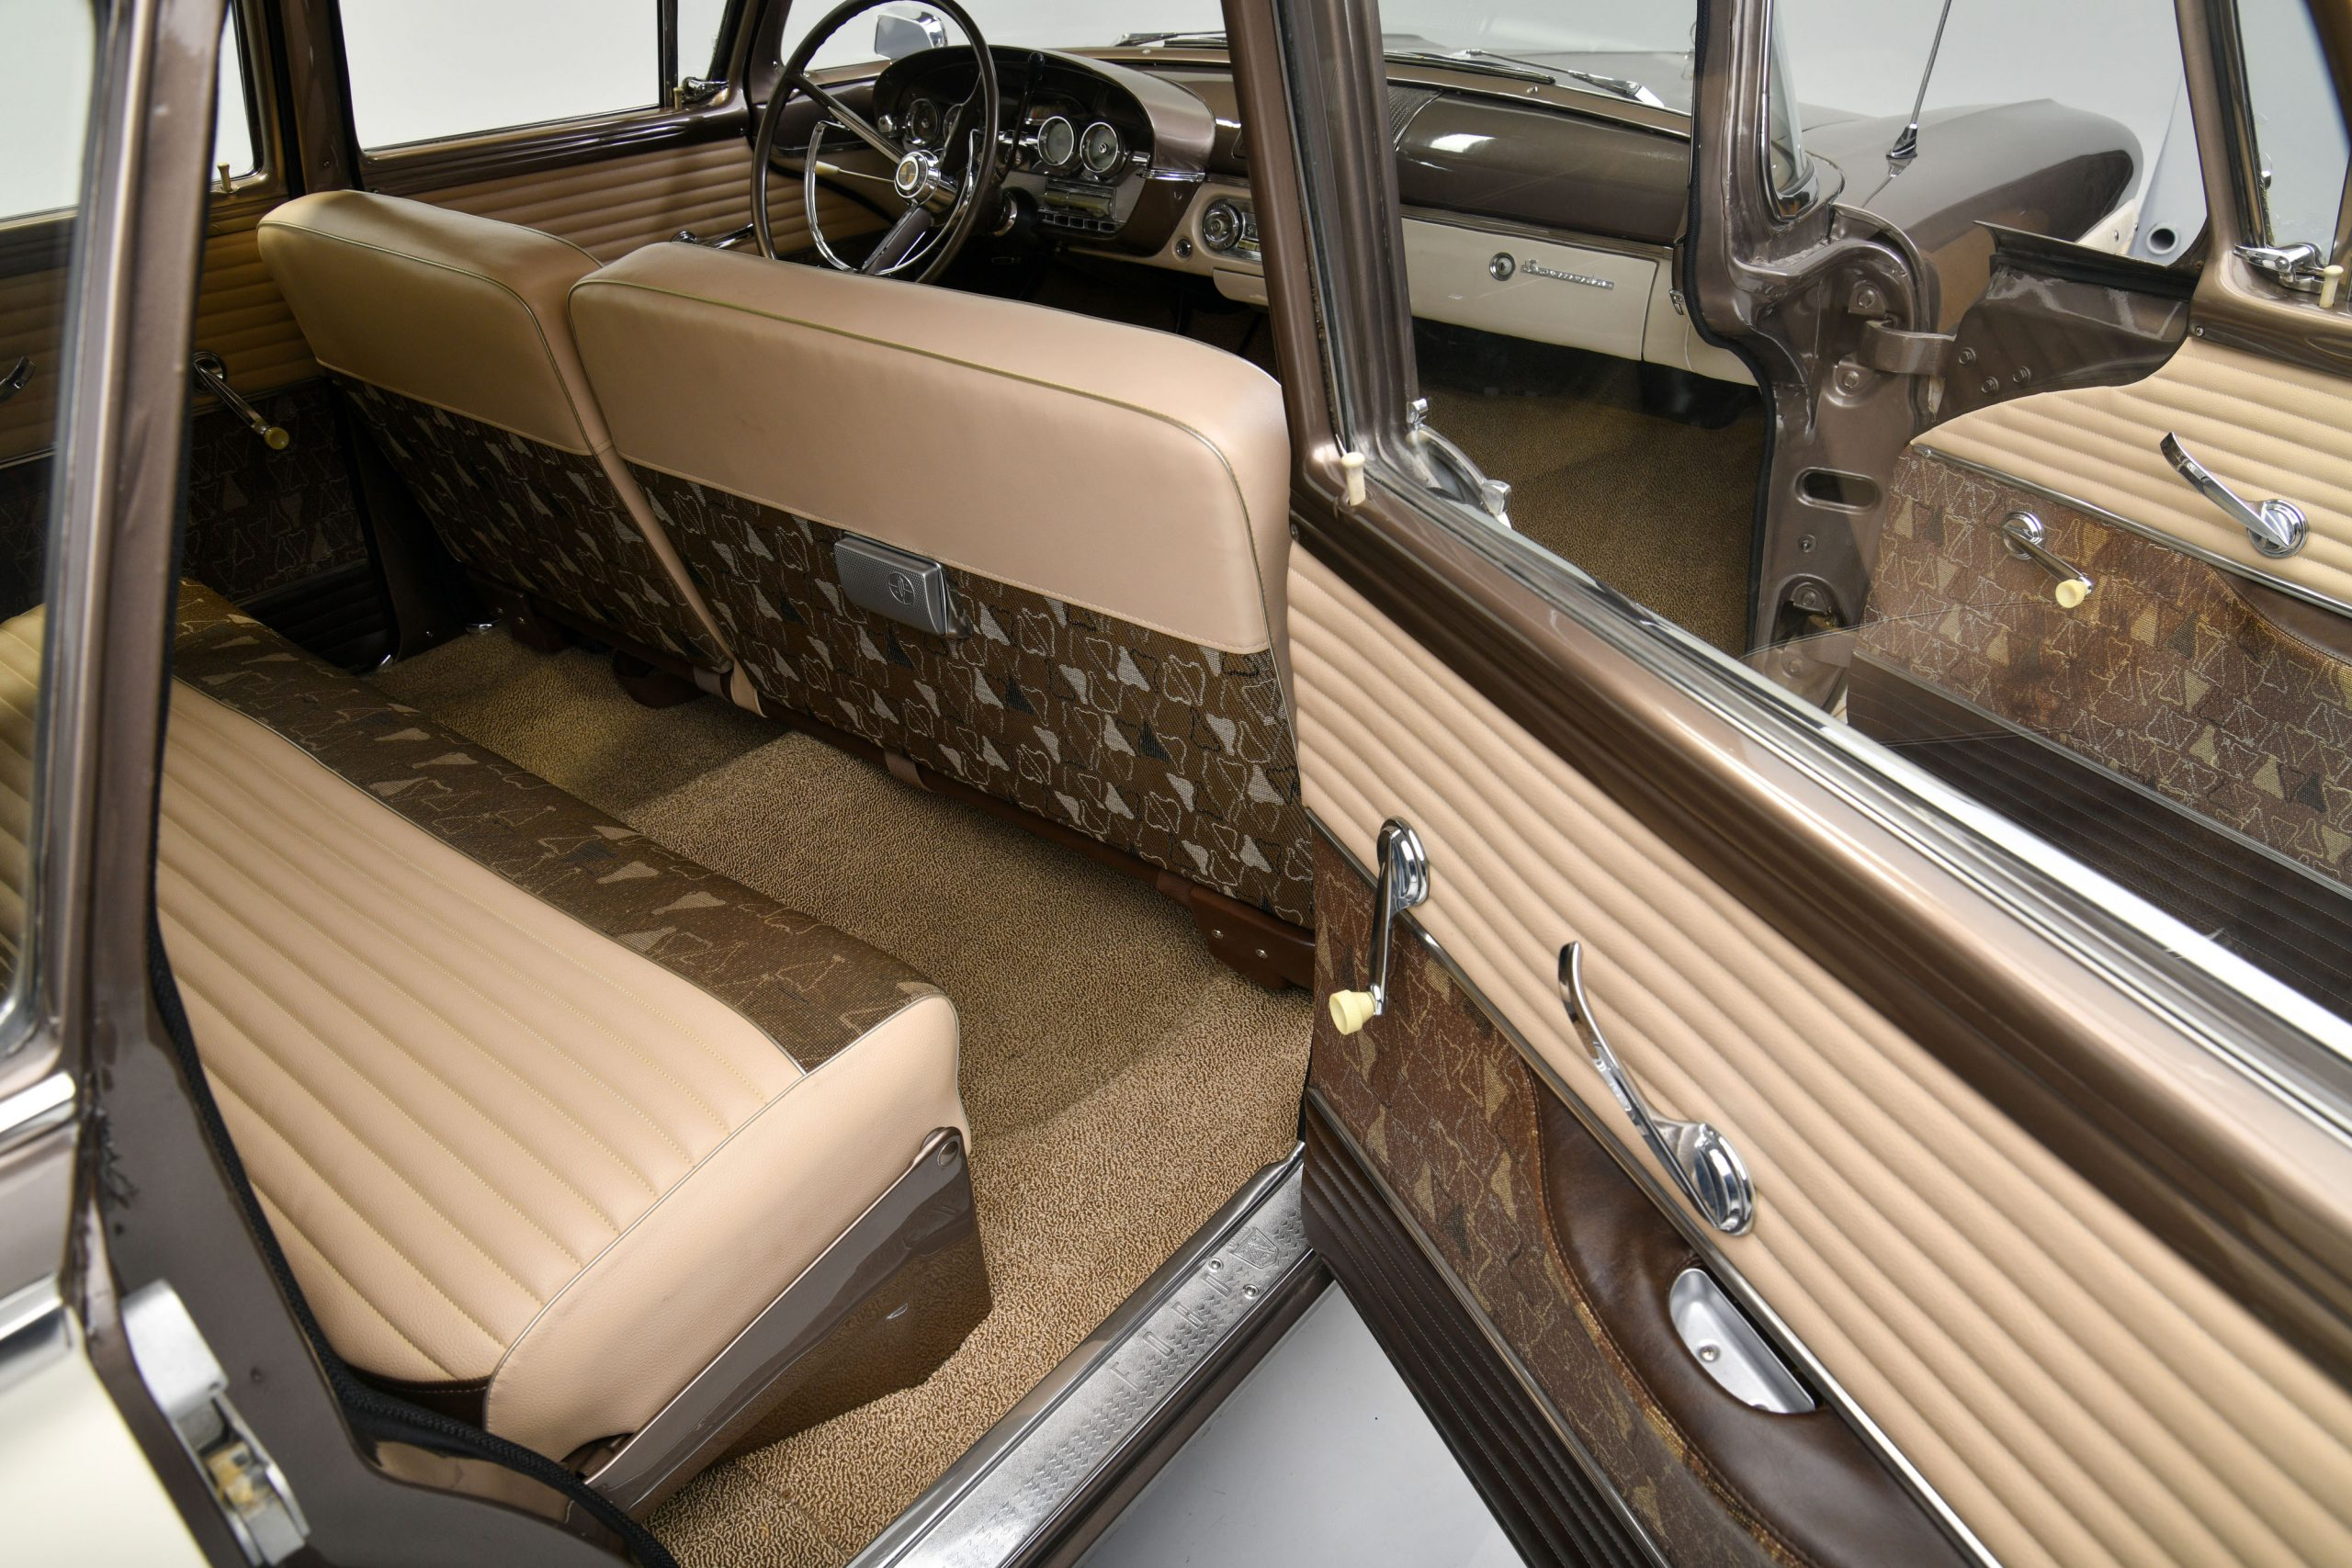 1958 EDSEL BERMUDA WAGON interior rear passenger door open